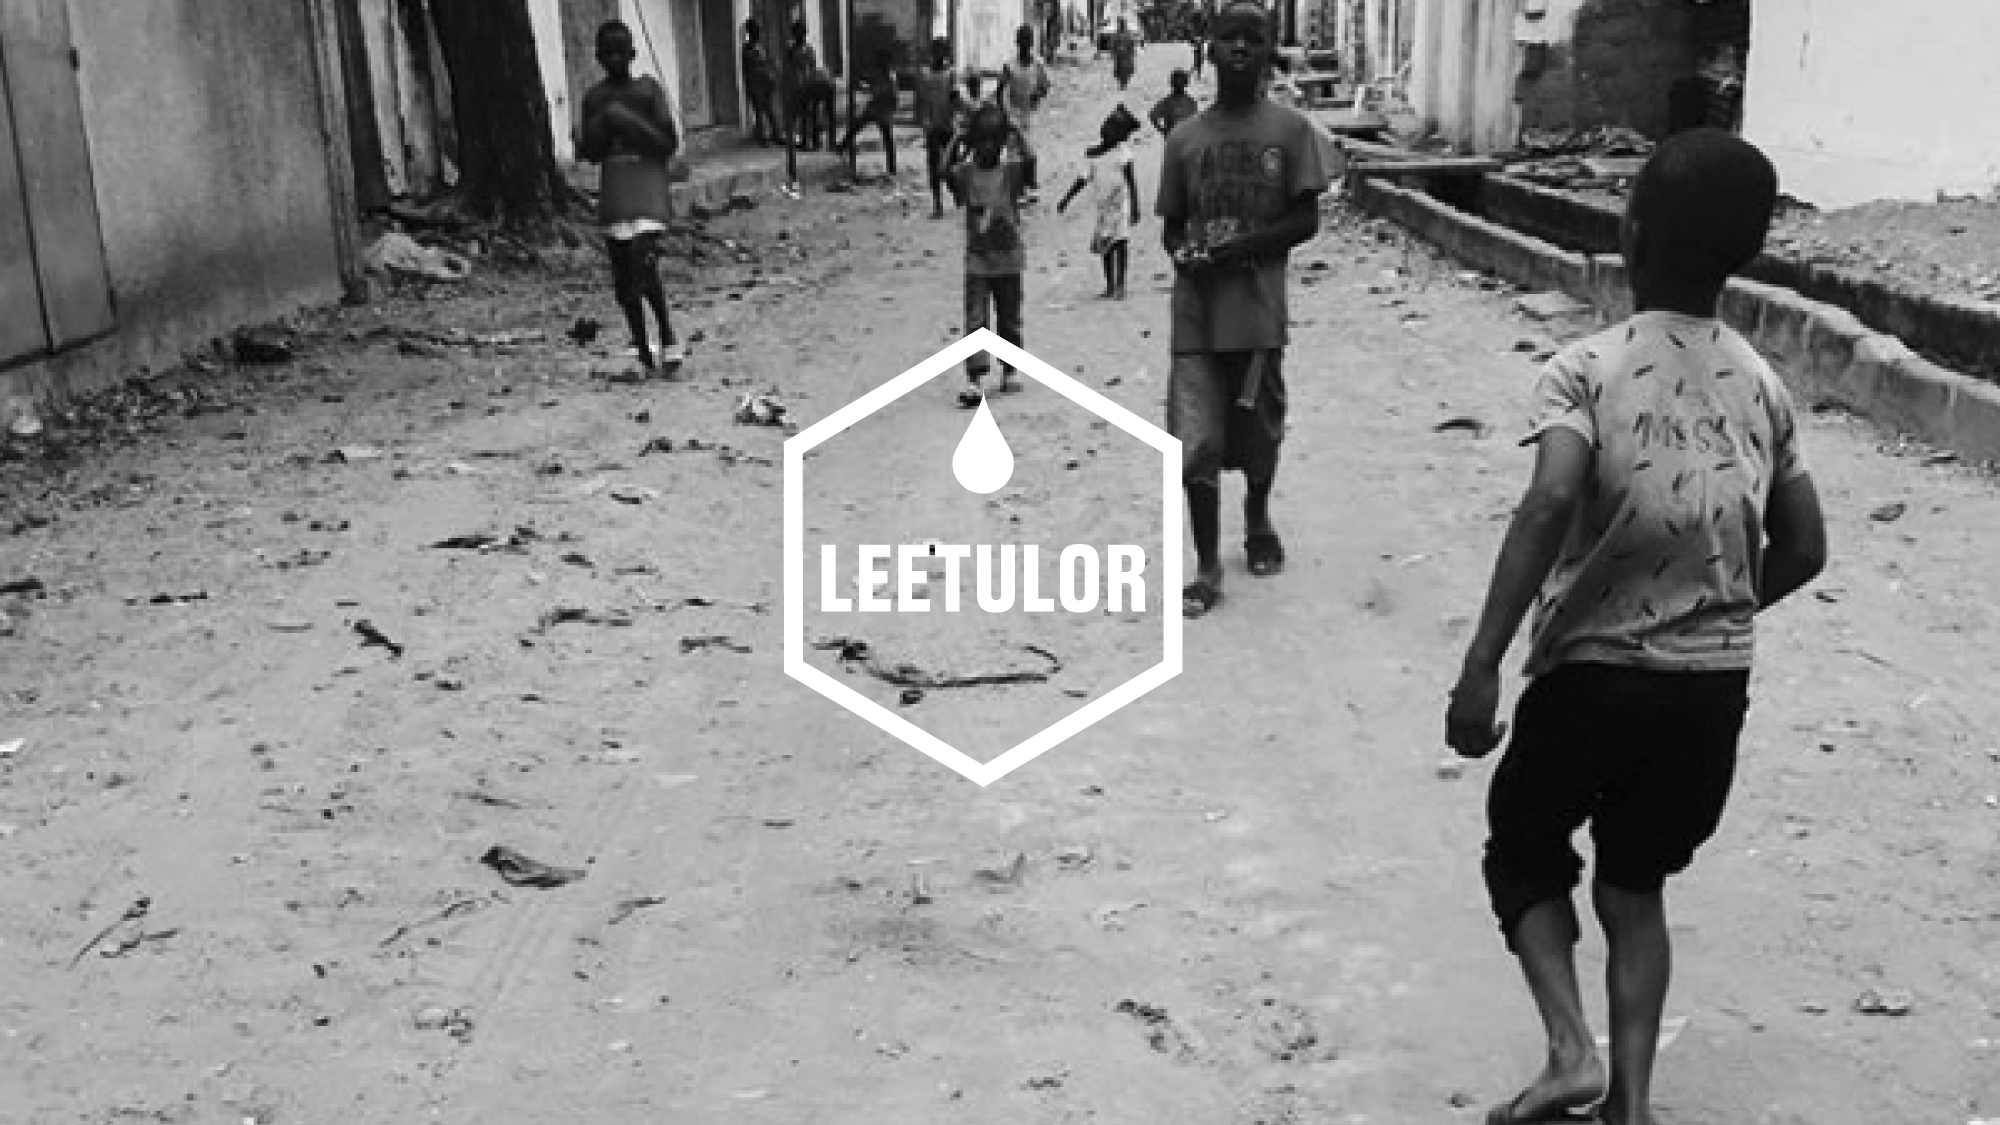 Leetulor_4